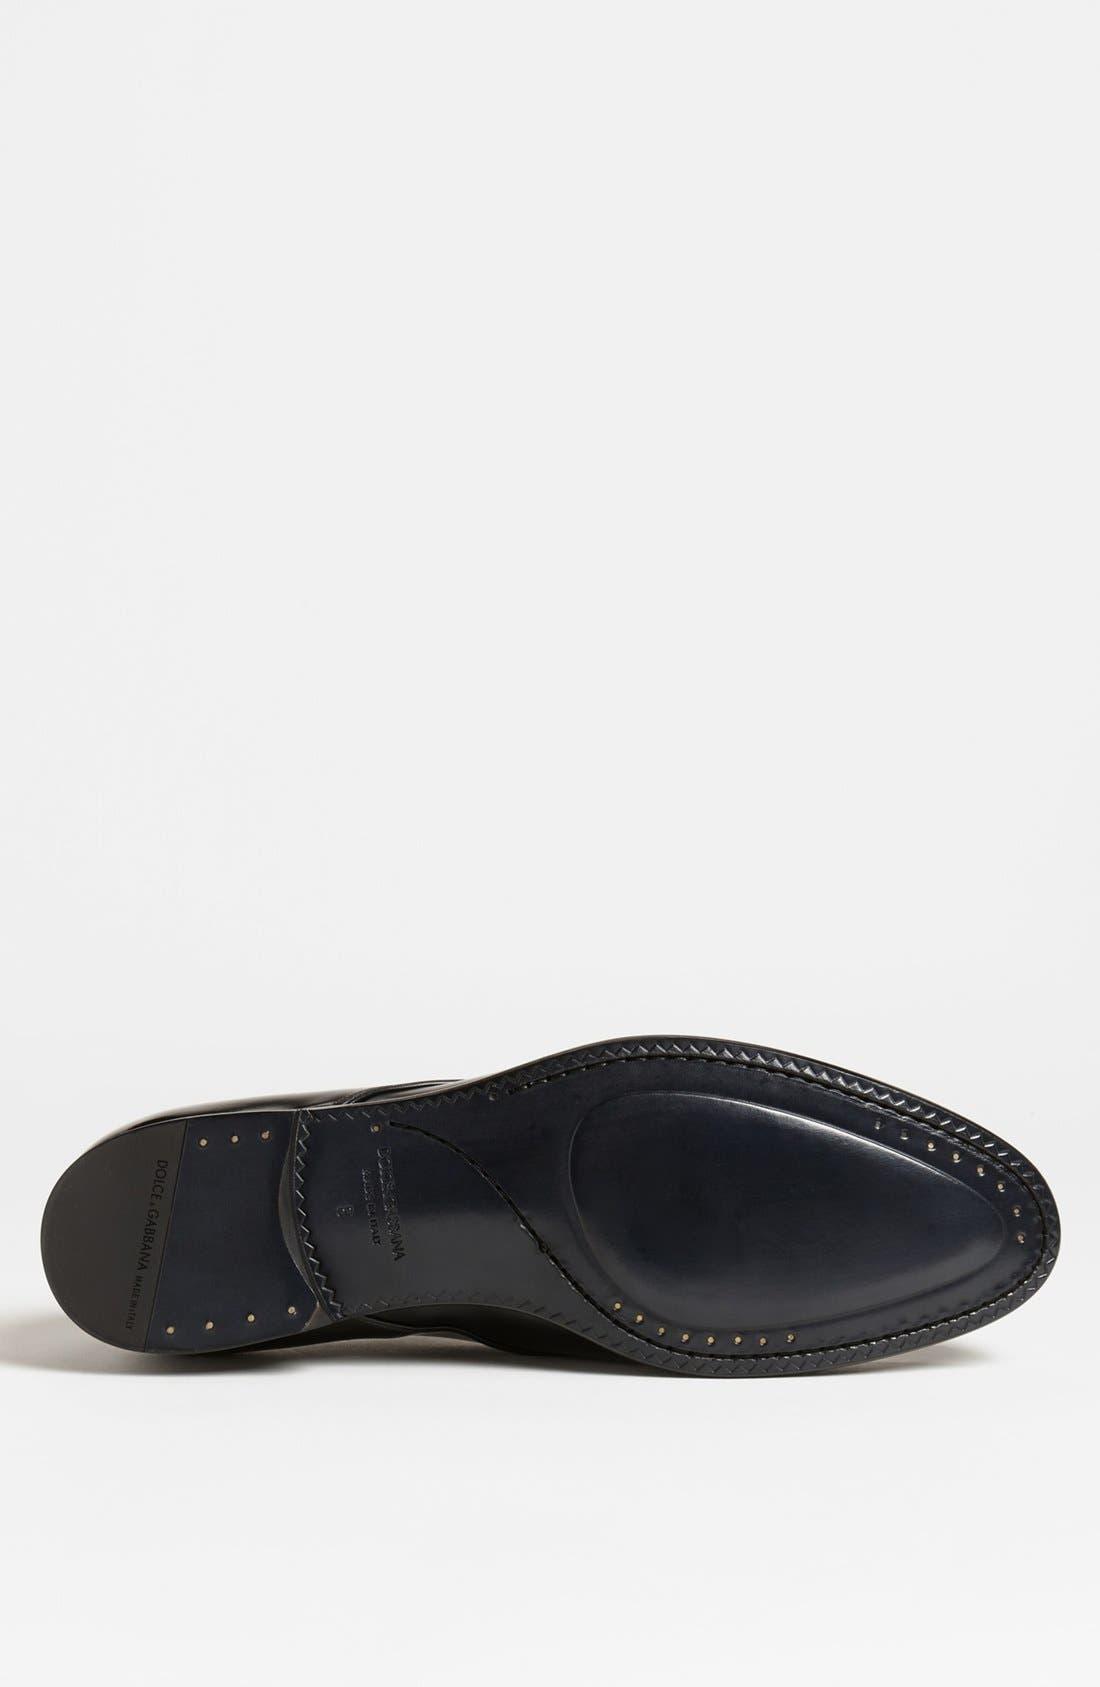 Alternate Image 4  - Dolce&Gabbana 'Napoli' Plain Toe Derby